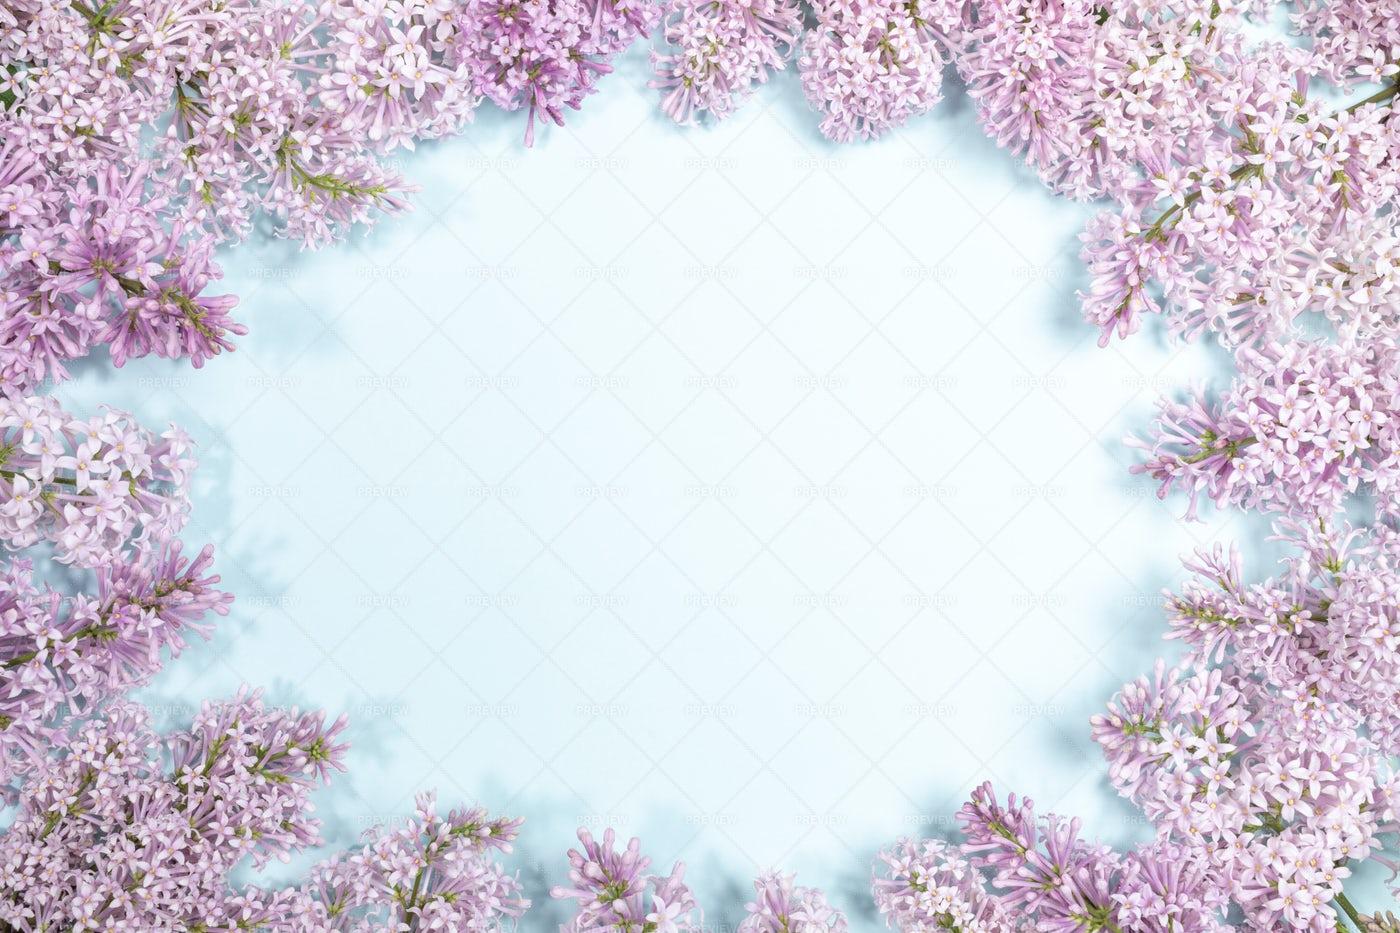 Lilac Flowers As Frame: Stock Photos